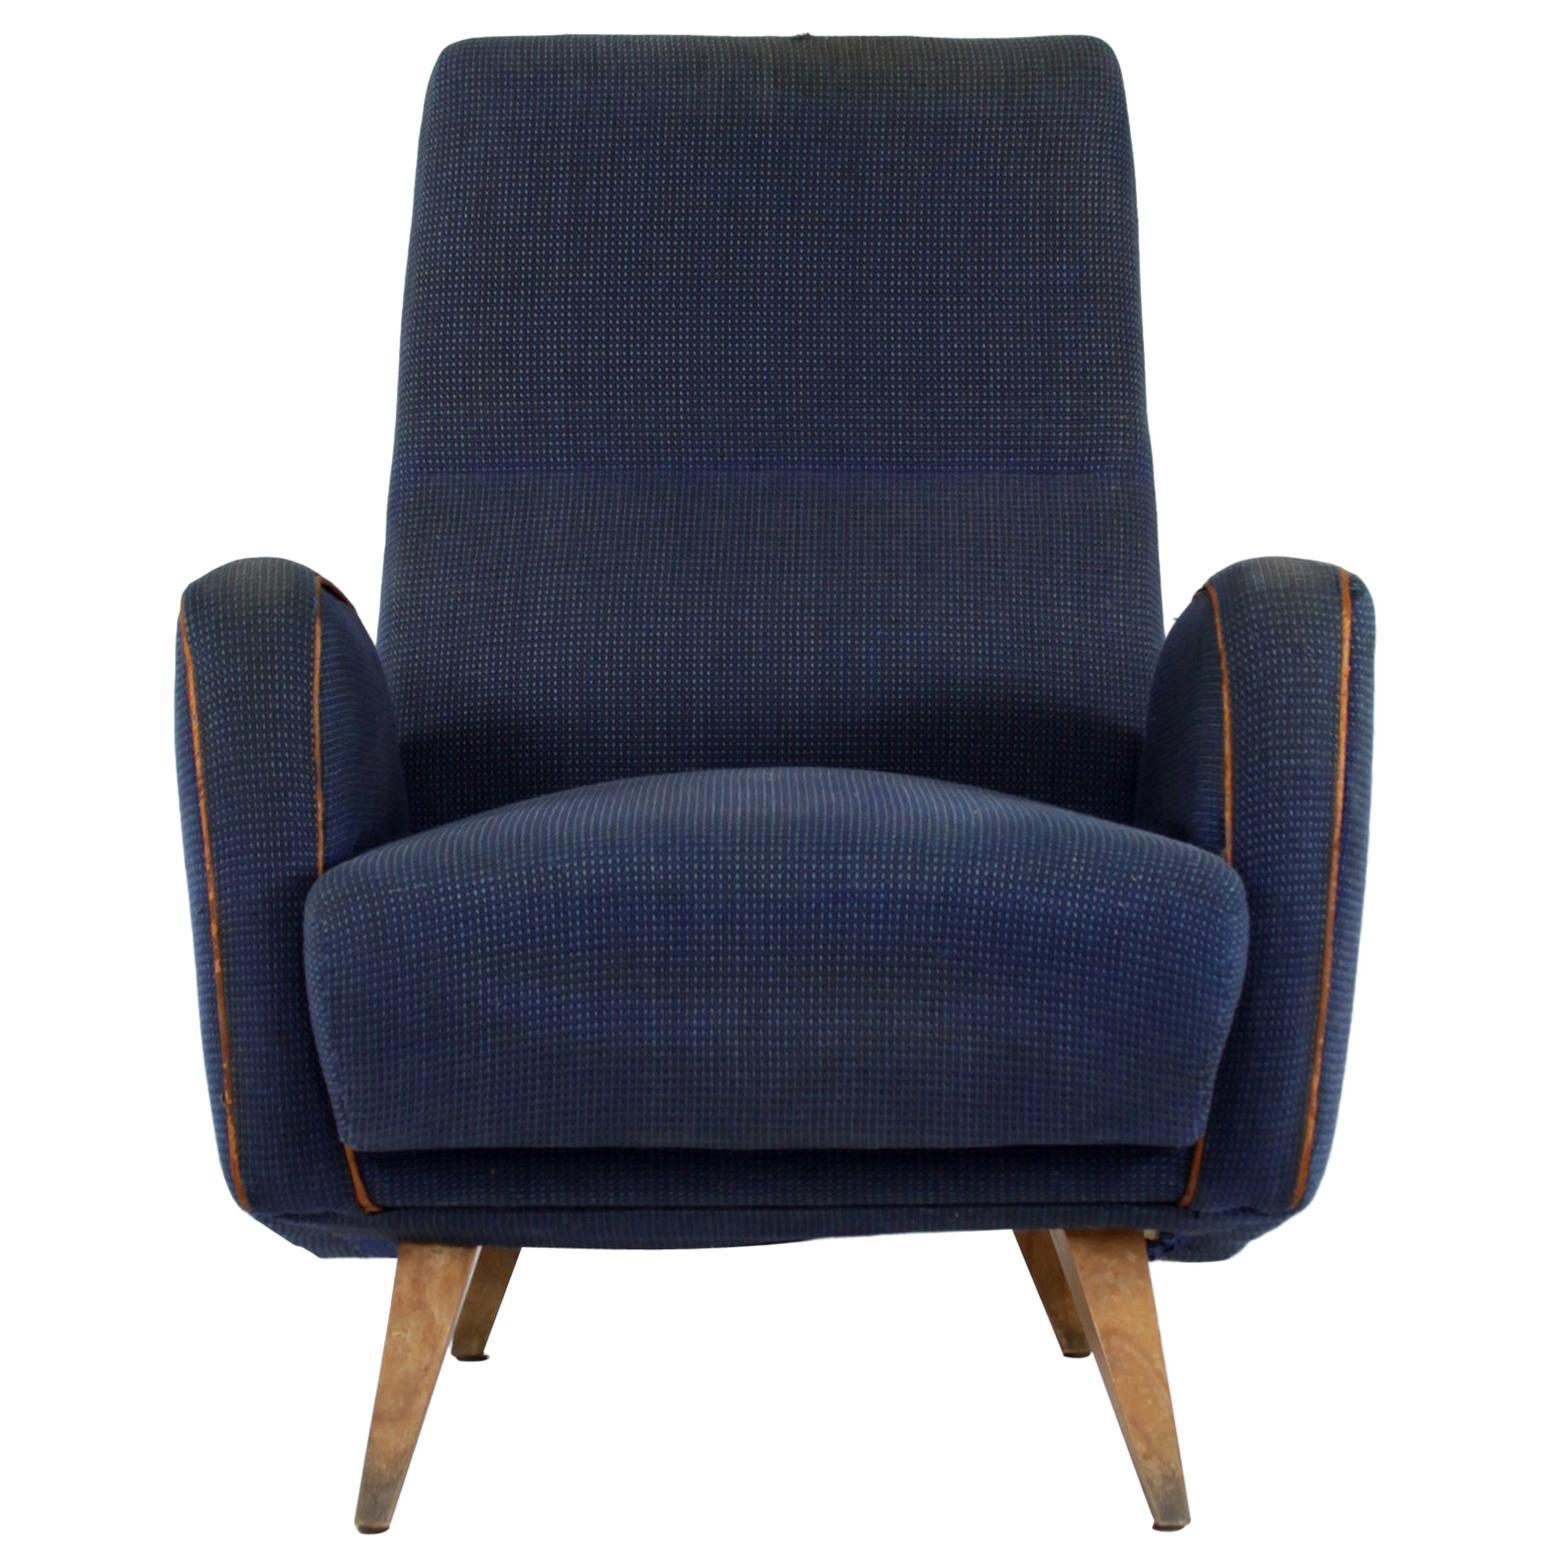 Armchair, Design by Nino Zoncada, Italy, 1950s